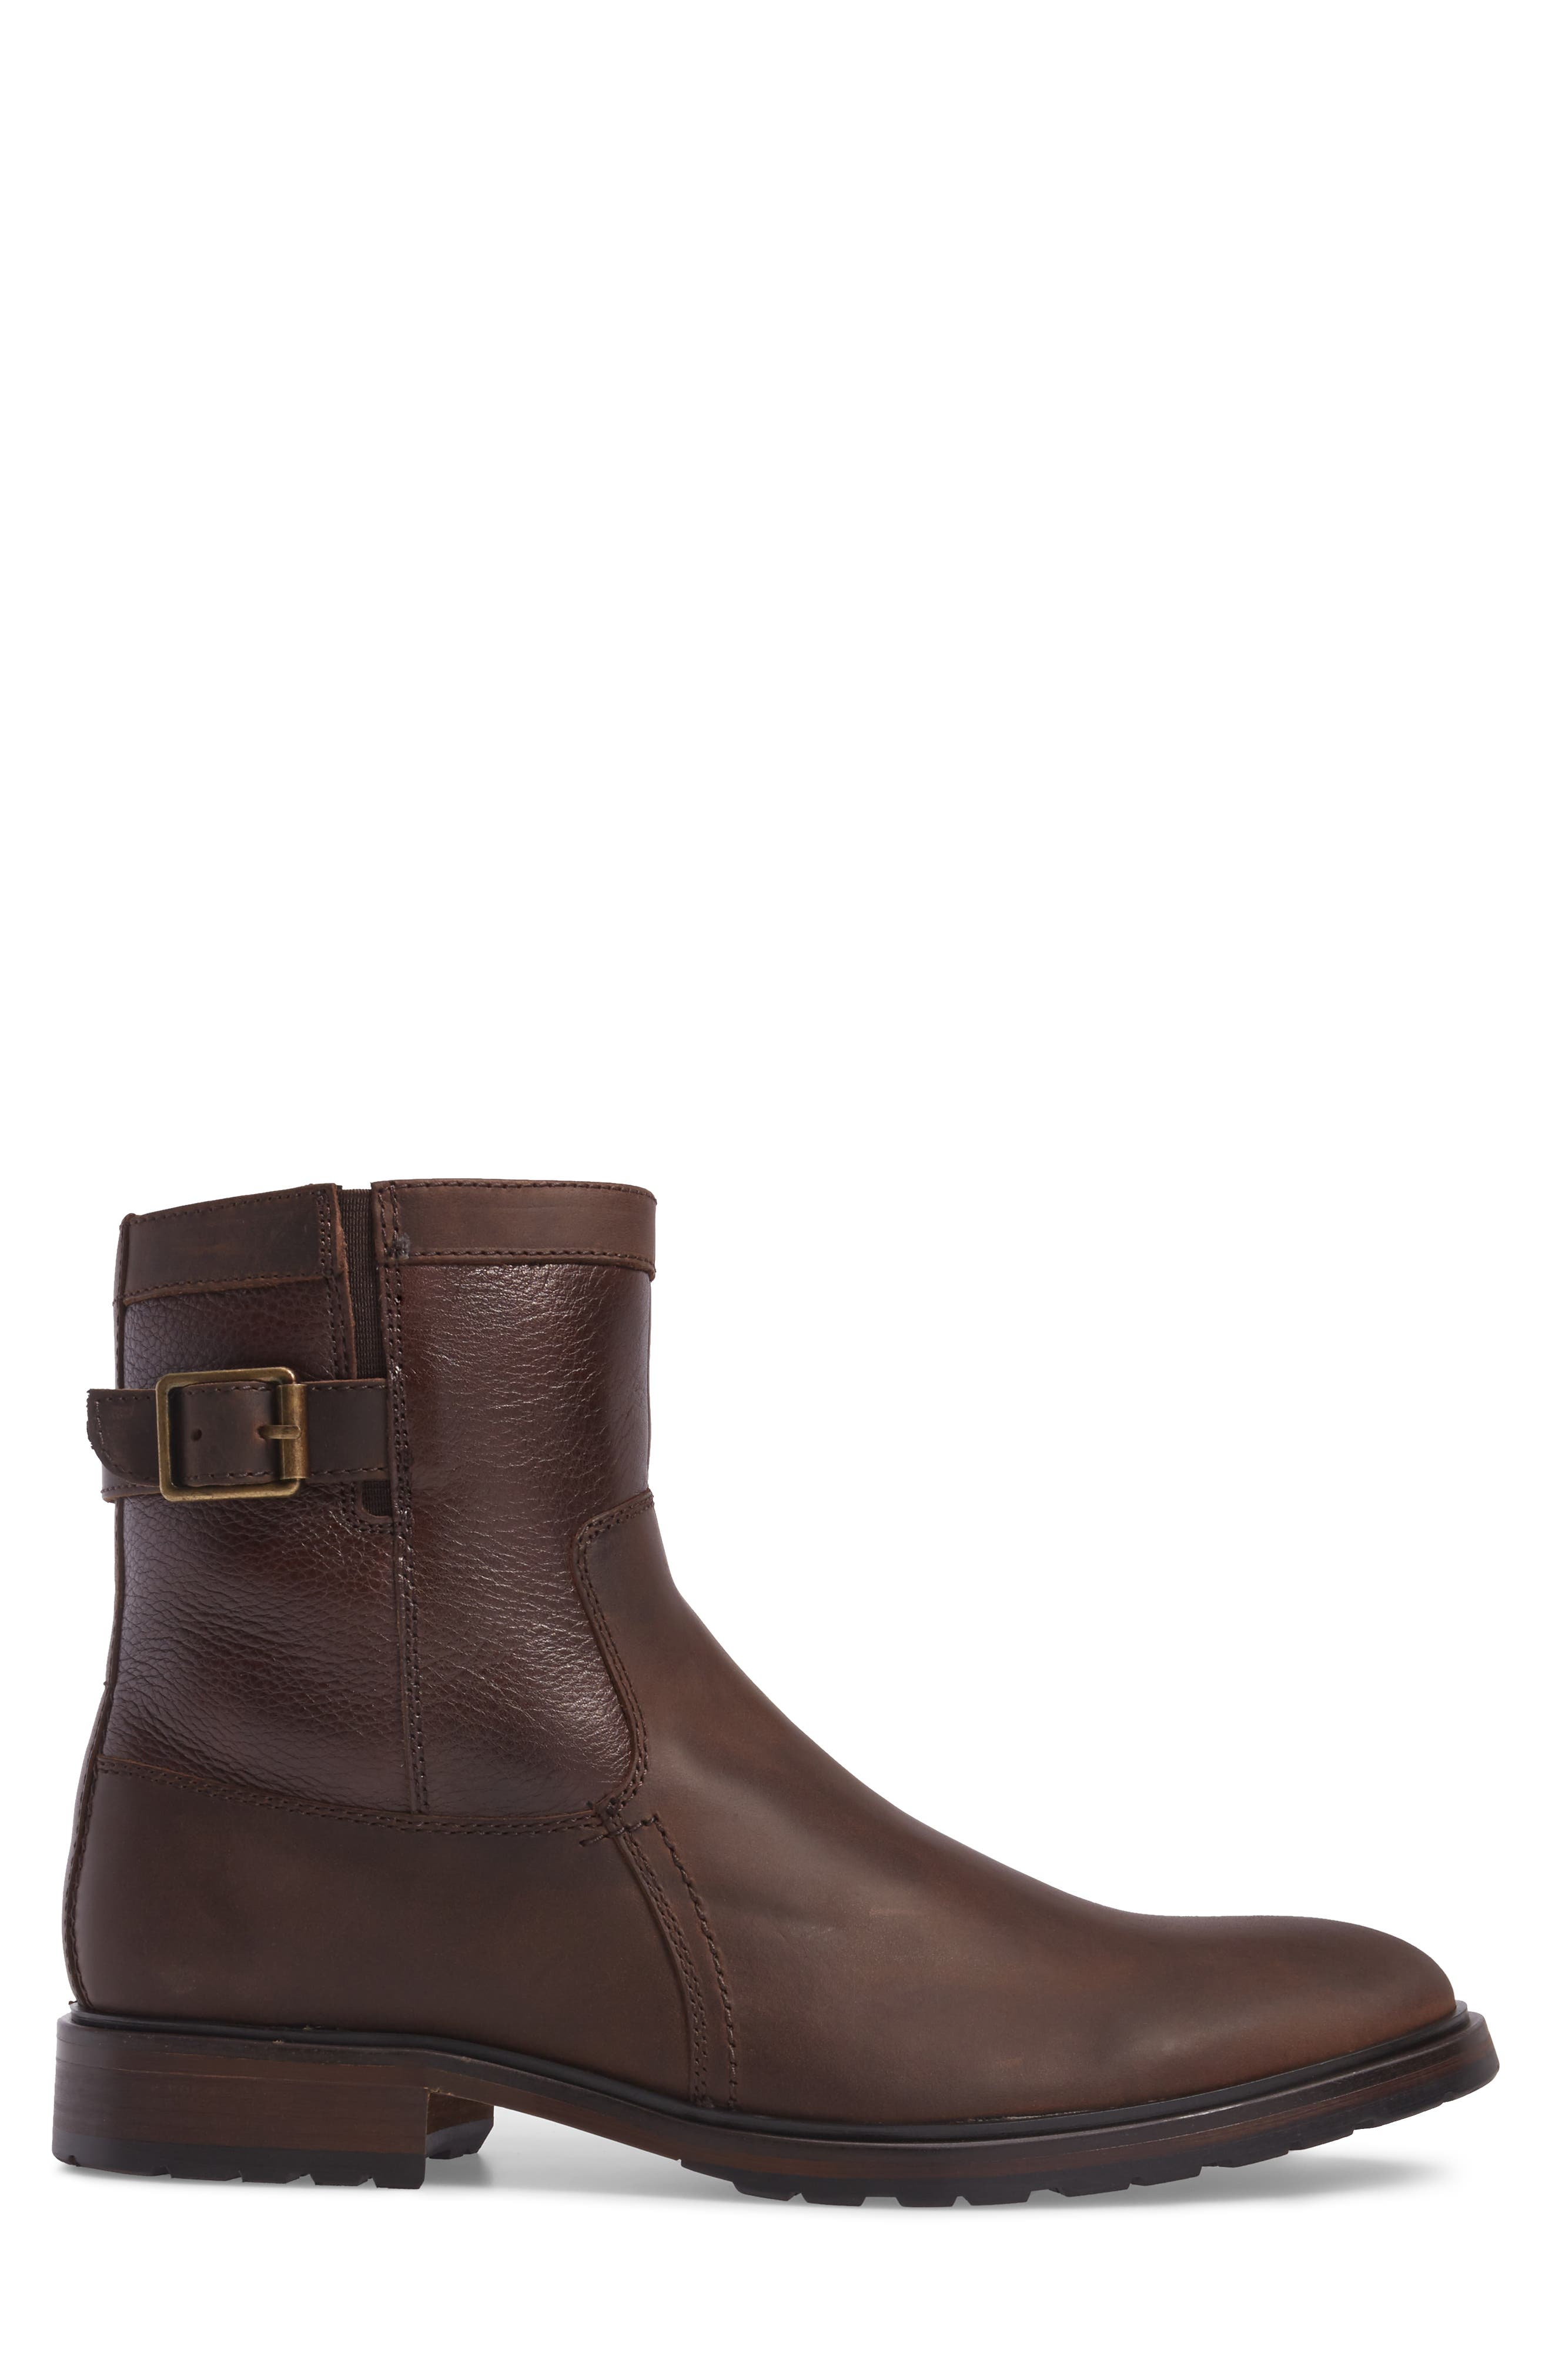 Myles Zip Boot,                             Alternate thumbnail 3, color,                             Dark Brown Leather